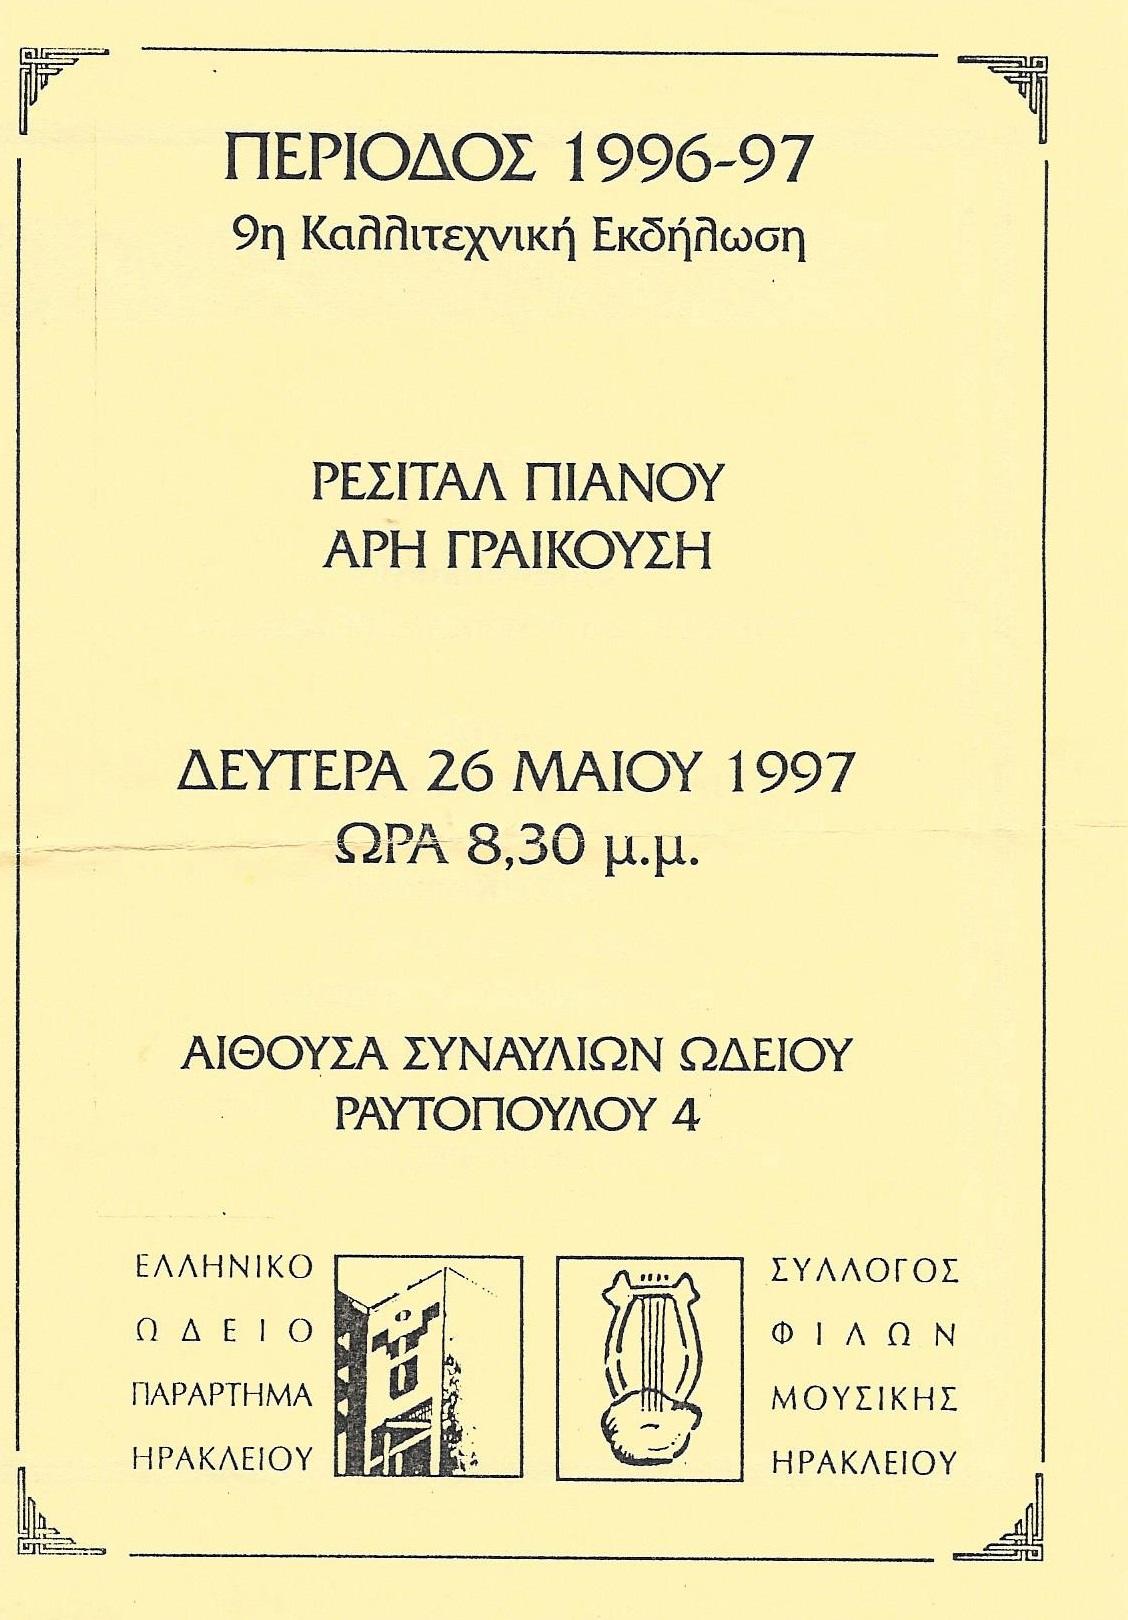 26-05-1997